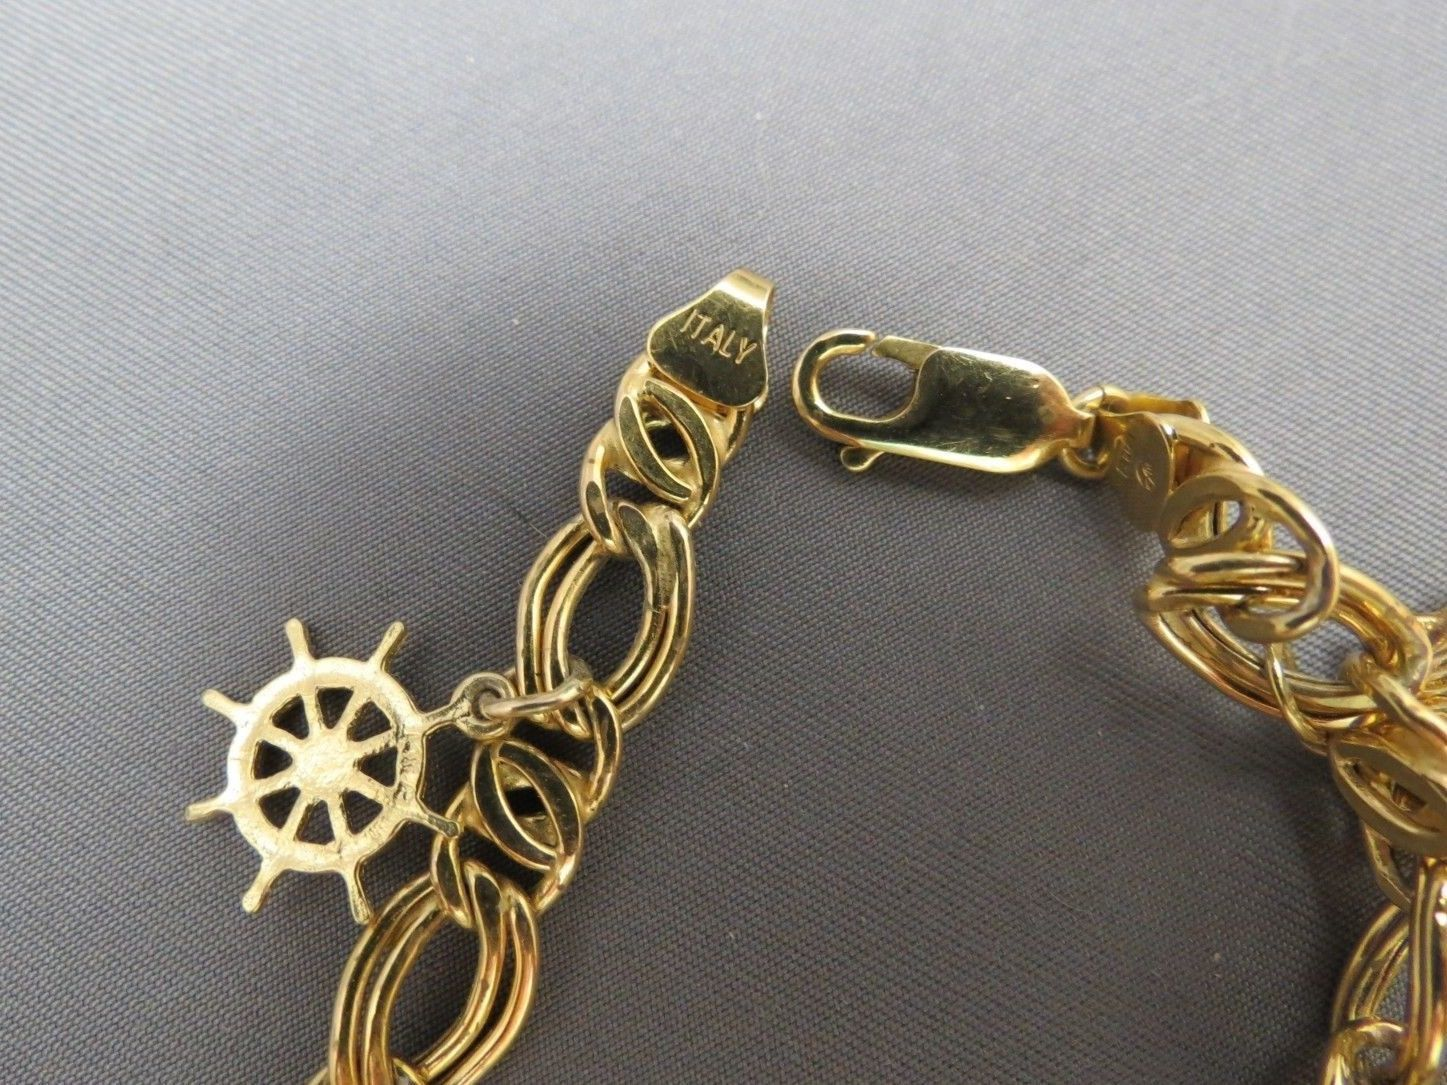 14k Charm Bracelet Yellow Gold 13.7g Marked Italy Chain Nautical Diamond Accent